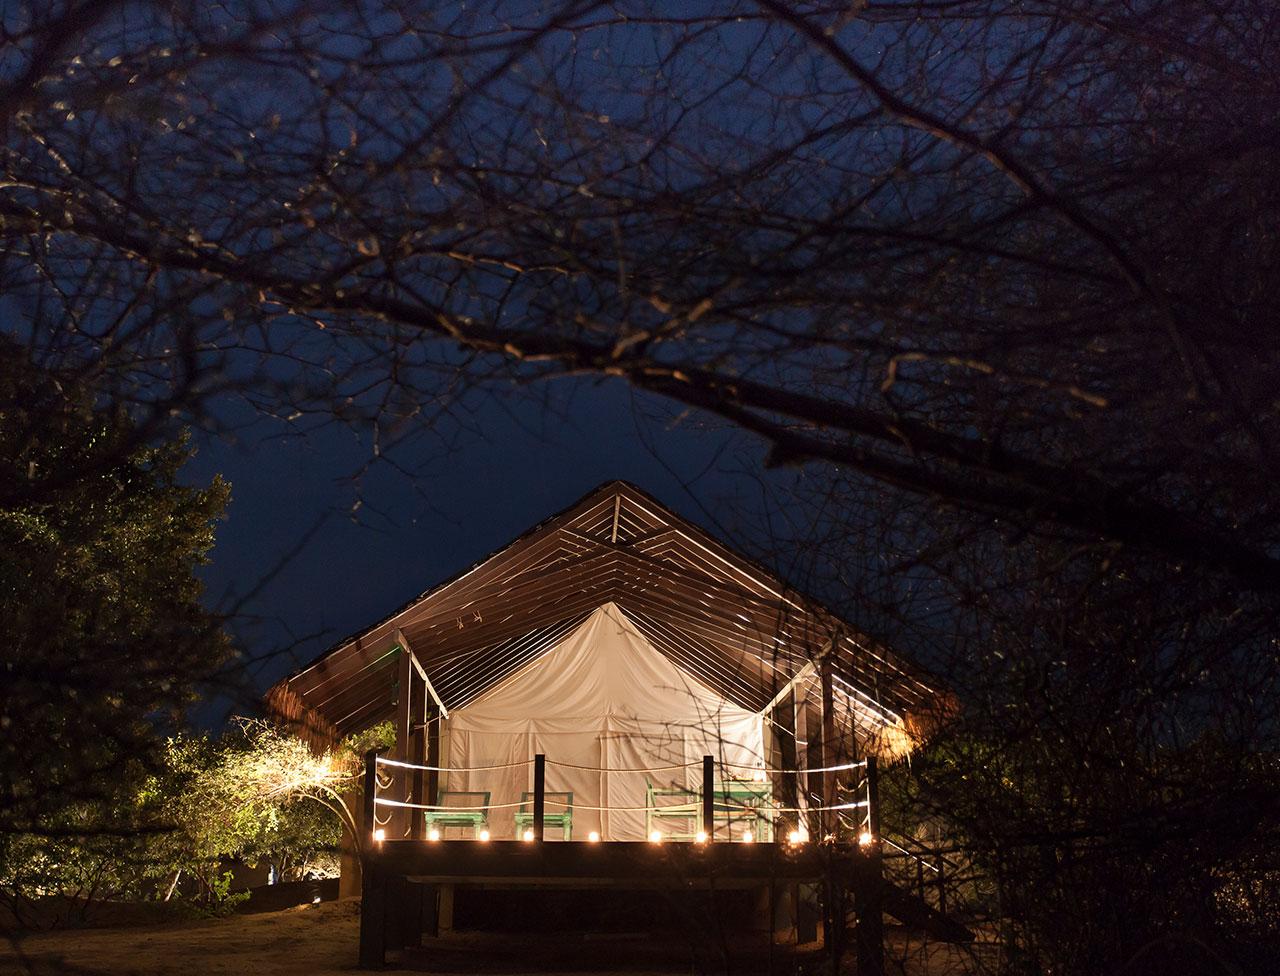 View of a tented villa at night